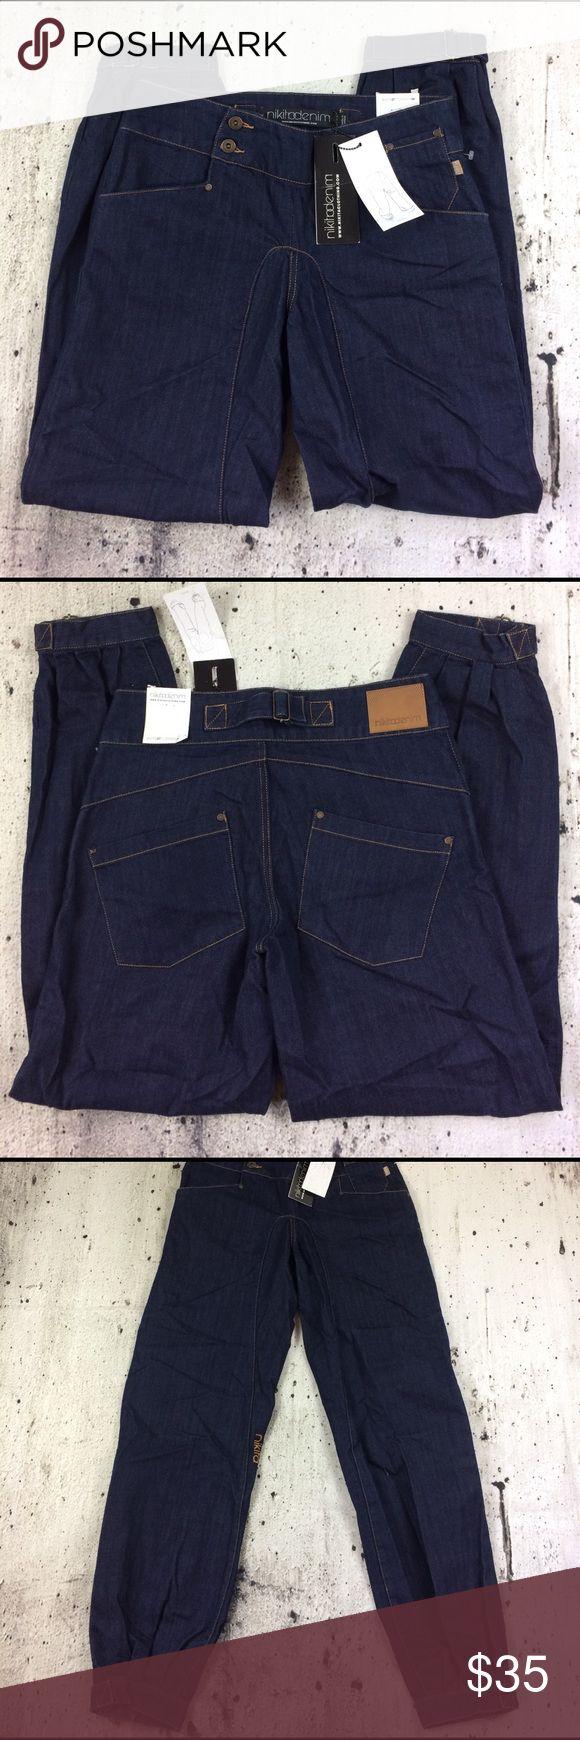 "Nikita the Reality jeans Nikita the Reality jeans 100% cotton inseam 34"" rise 10"" Nikita Jeans"